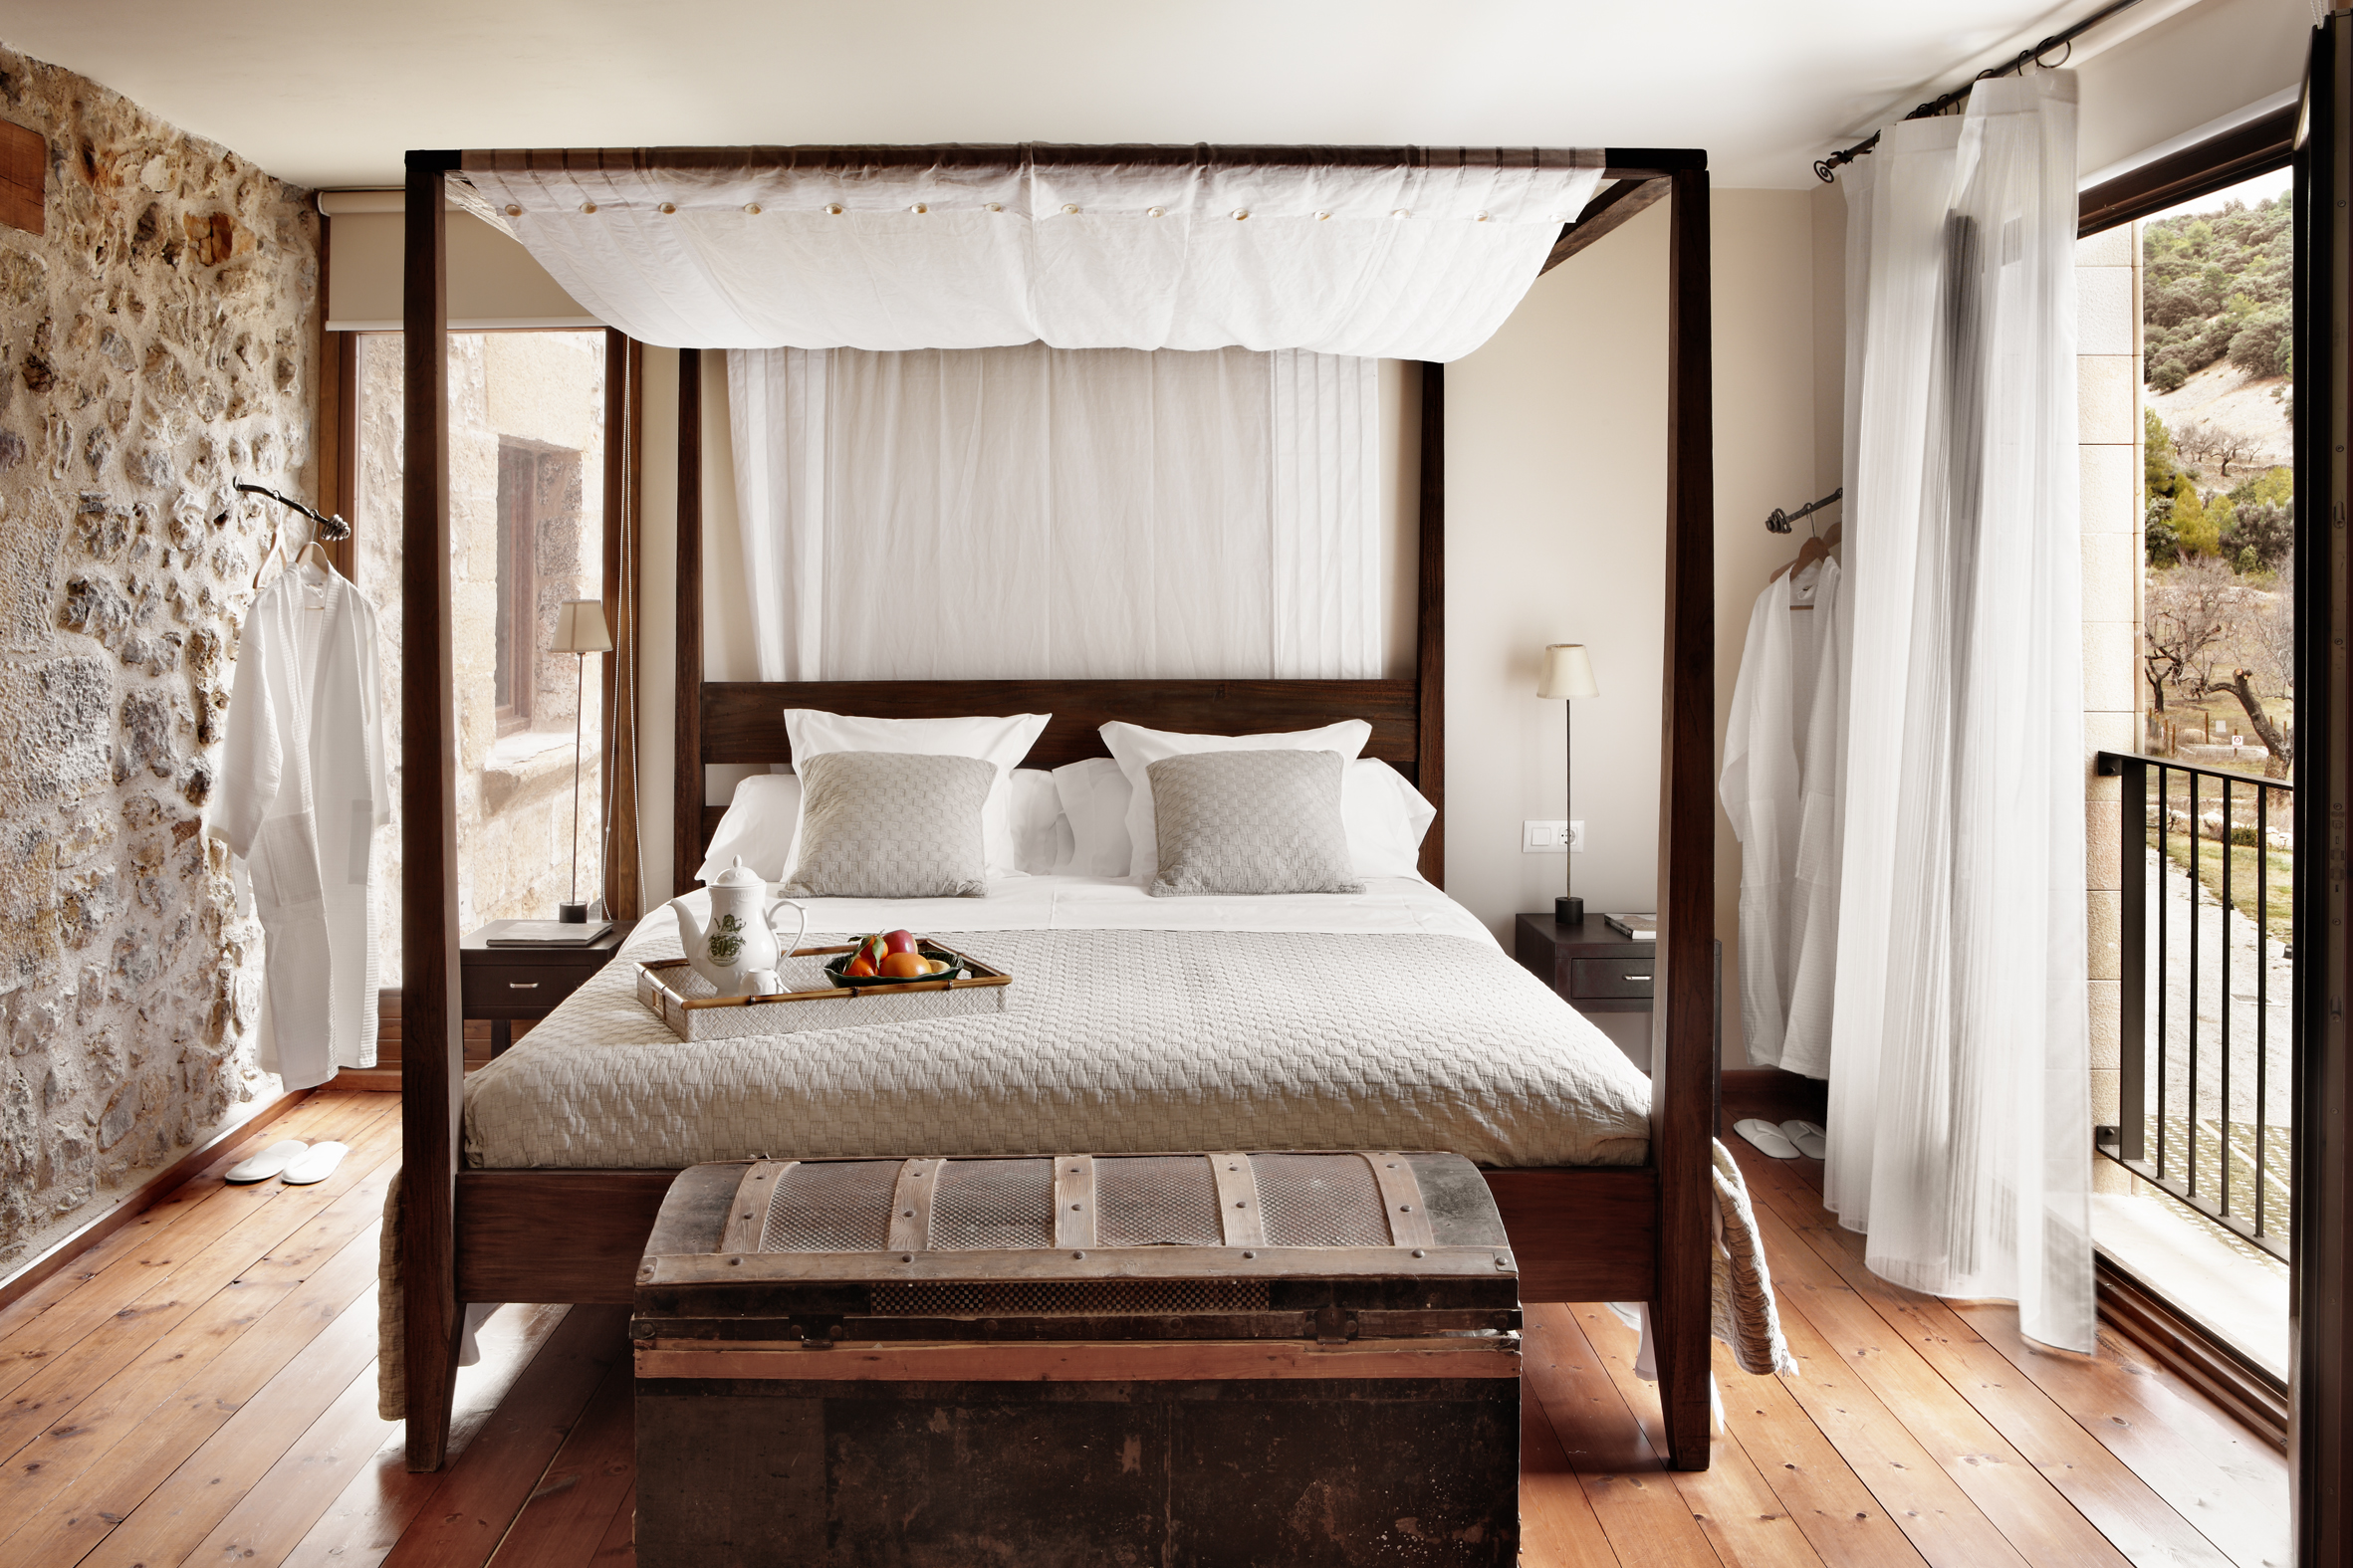 rustic boutique hotel luxury spain converted farmhouse